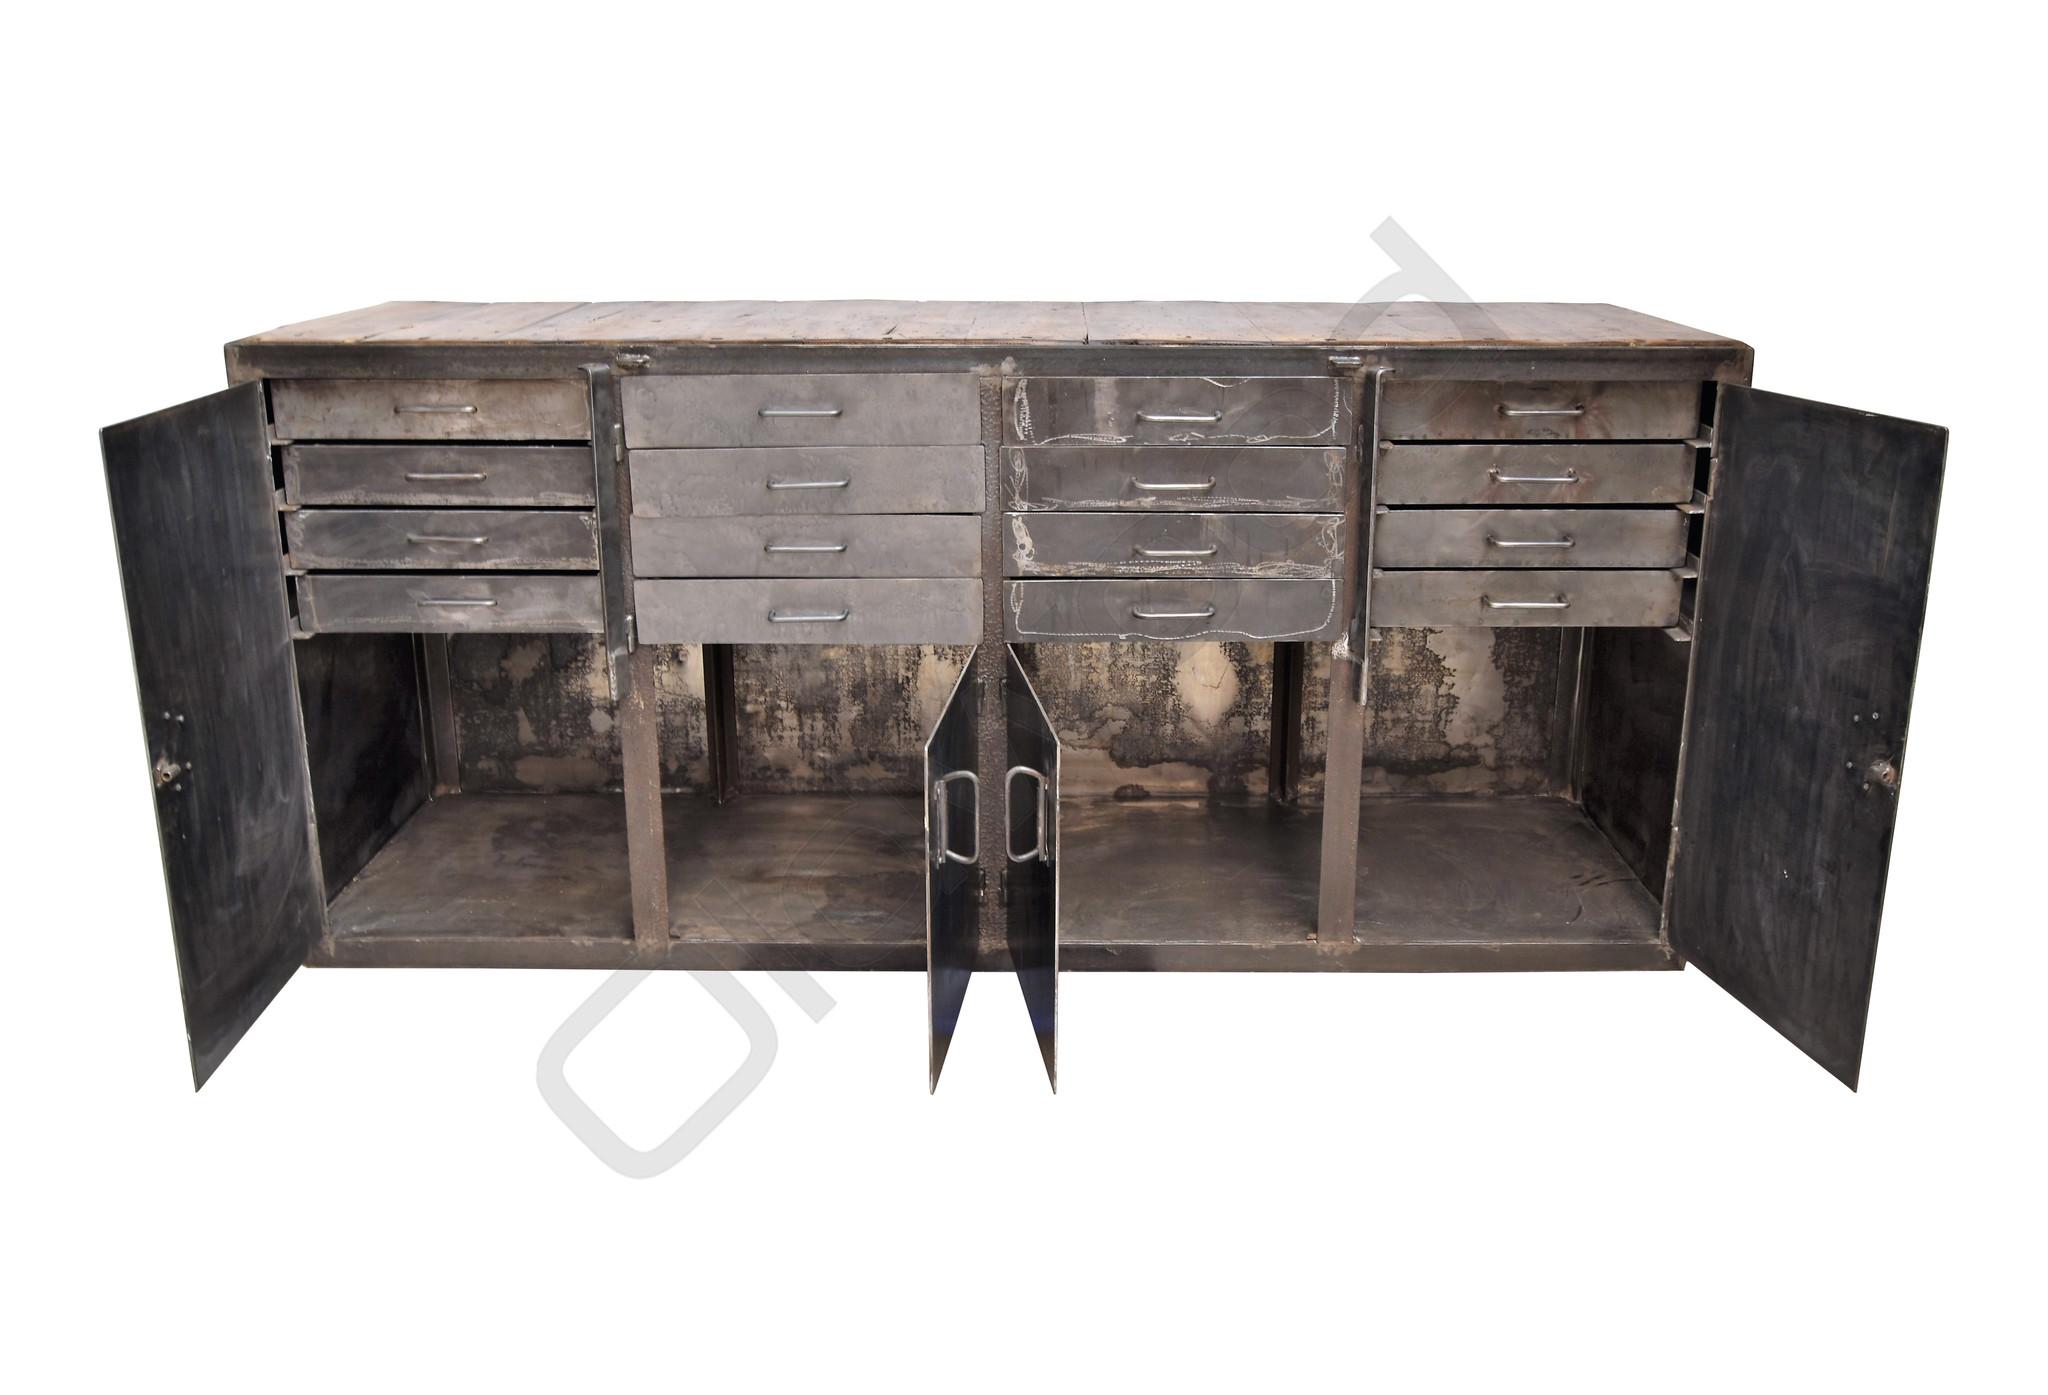 Stoere metalen dressoir